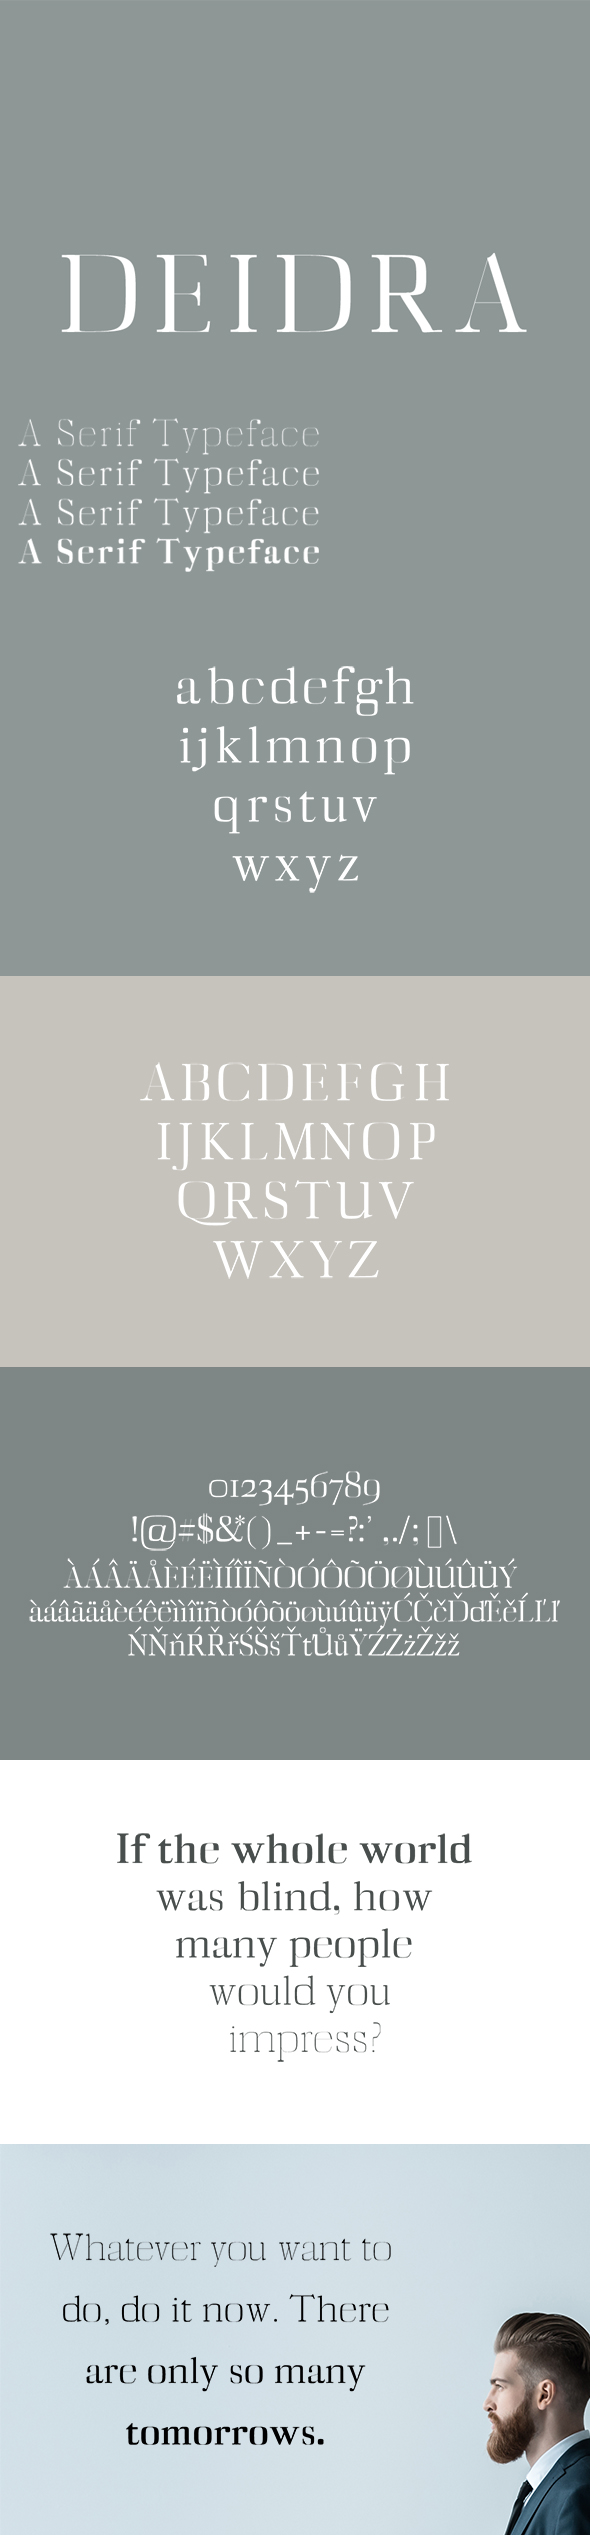 Diedra Serif Typeface - Serif Fonts